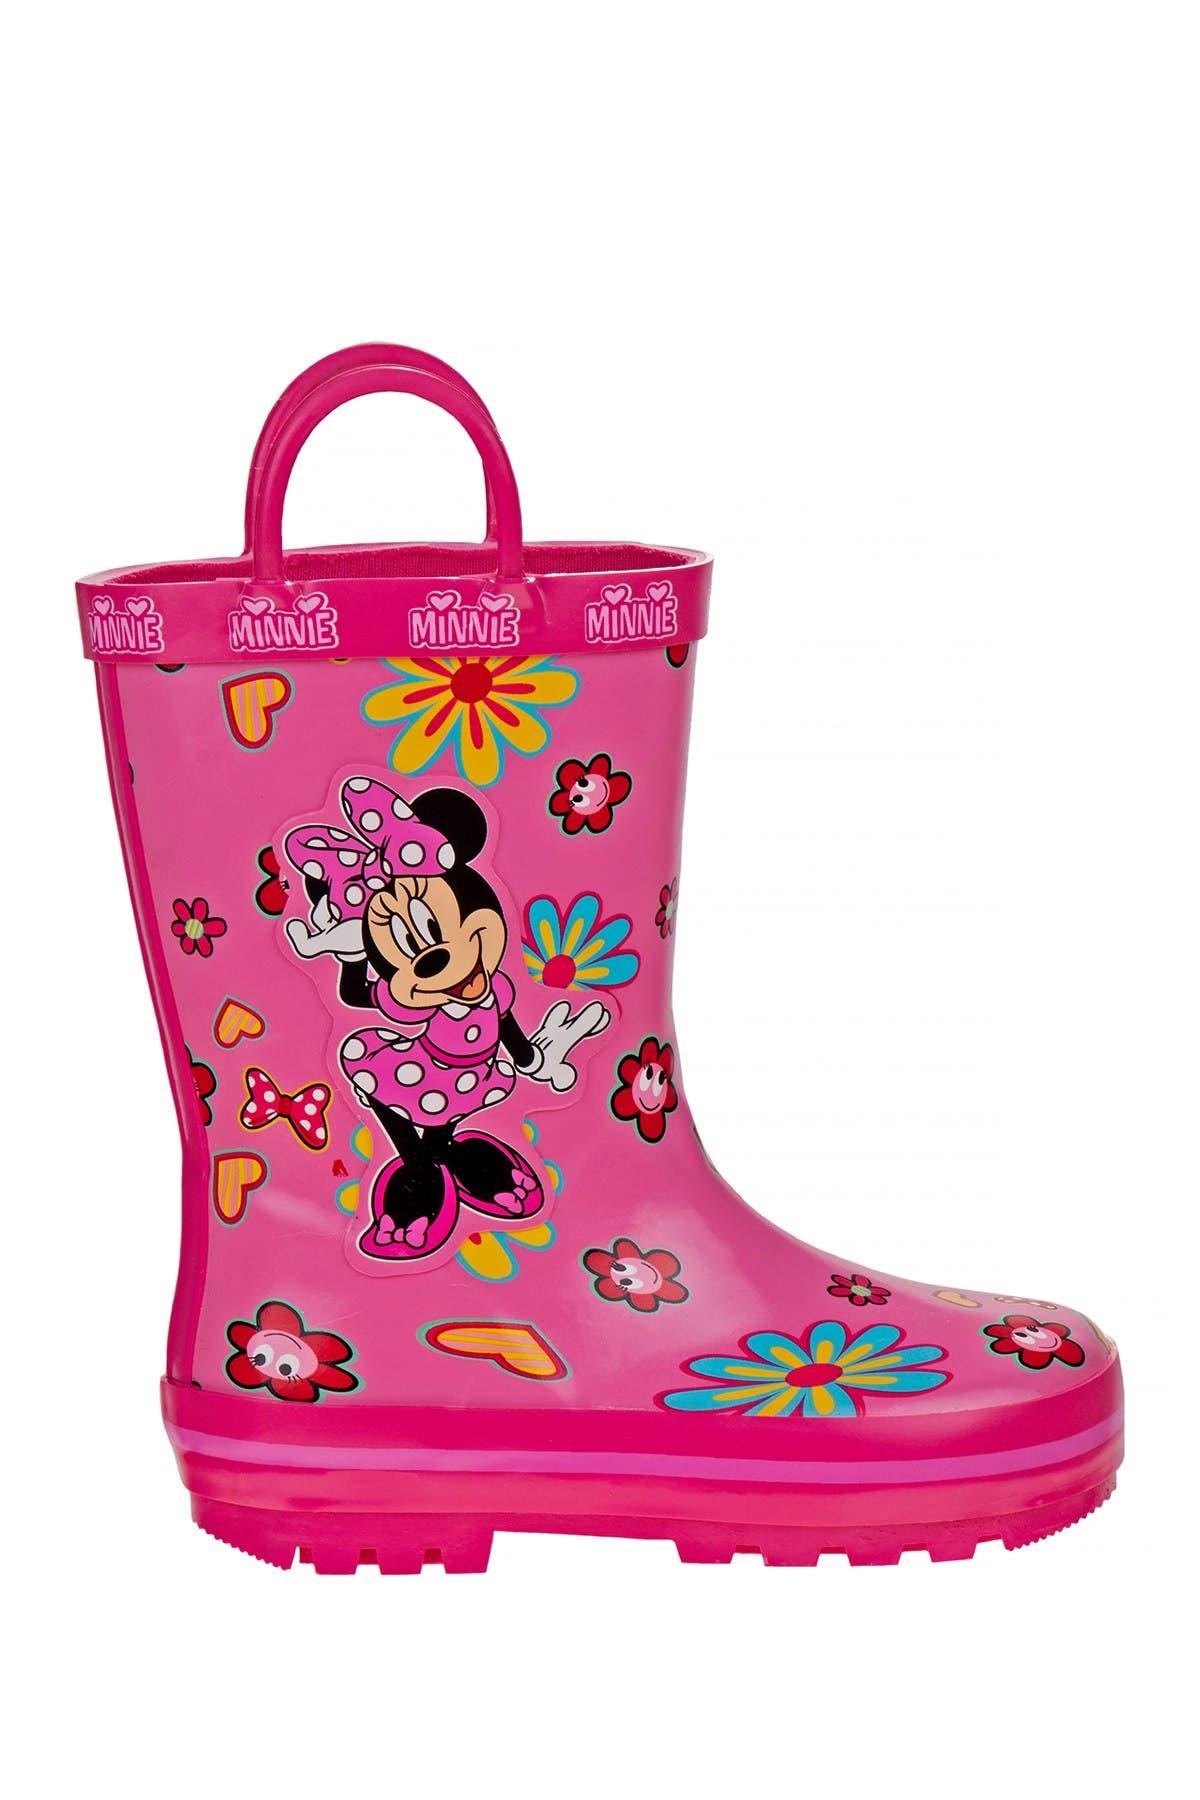 Josmo Minnie Mouse Rain Boots